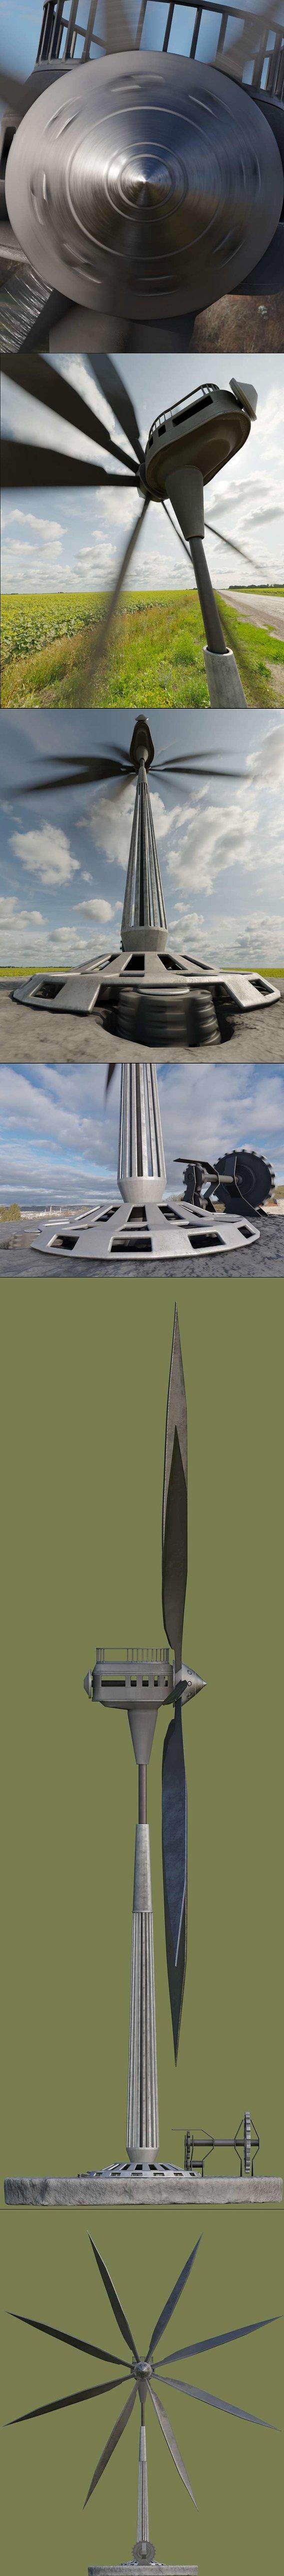 Steampunk Windturbine (Textured High-Poly) Blender-2.92